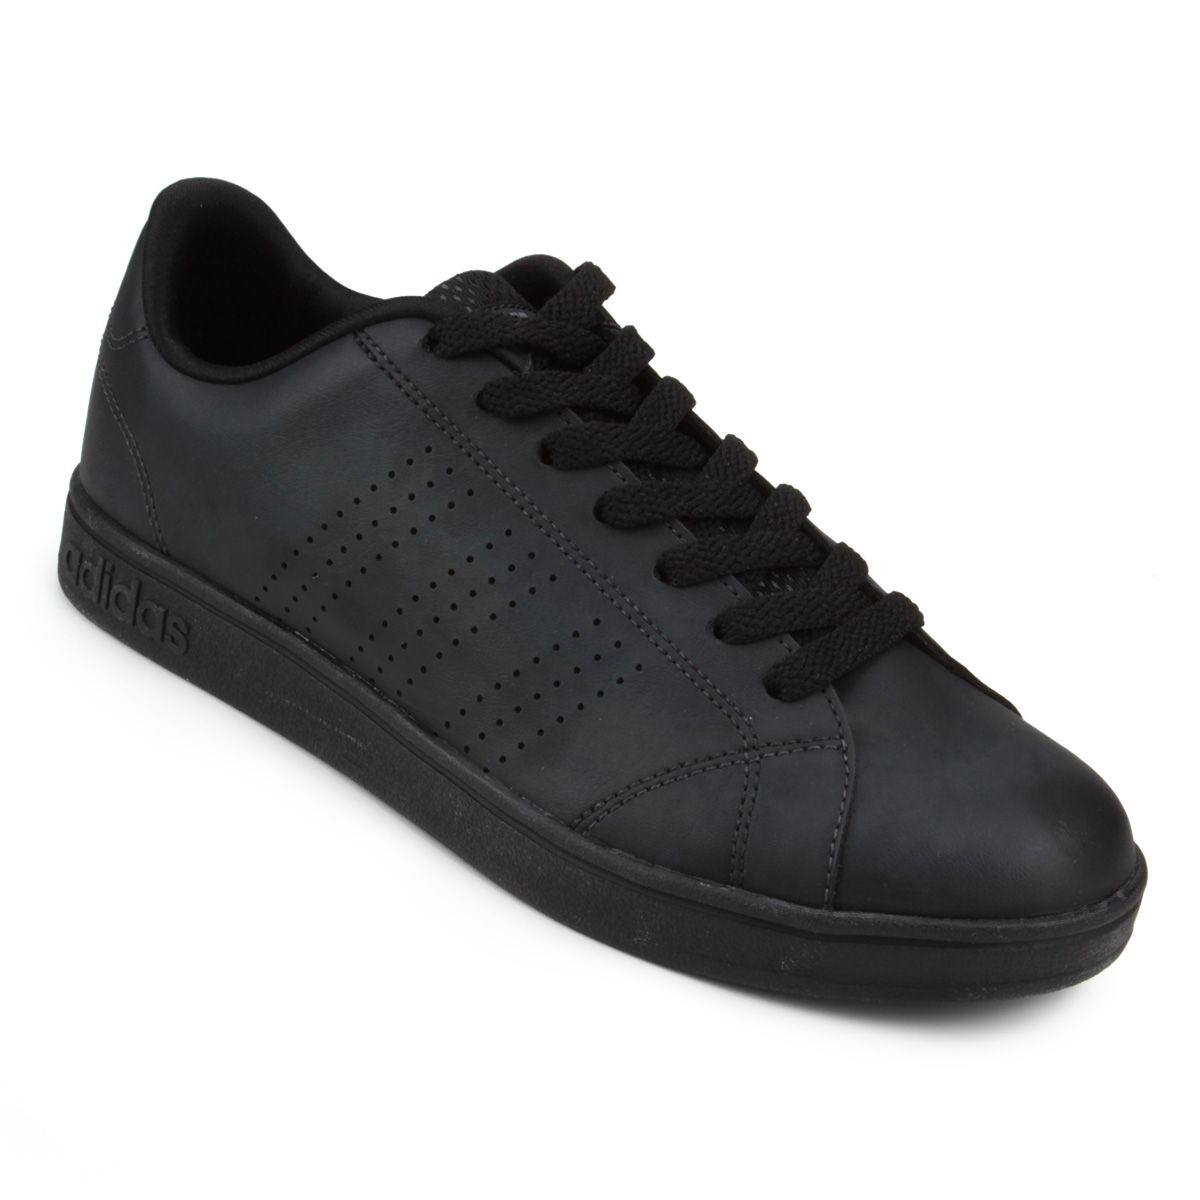 Tênis Adidas Vs Advantage CL Masculino - Preto